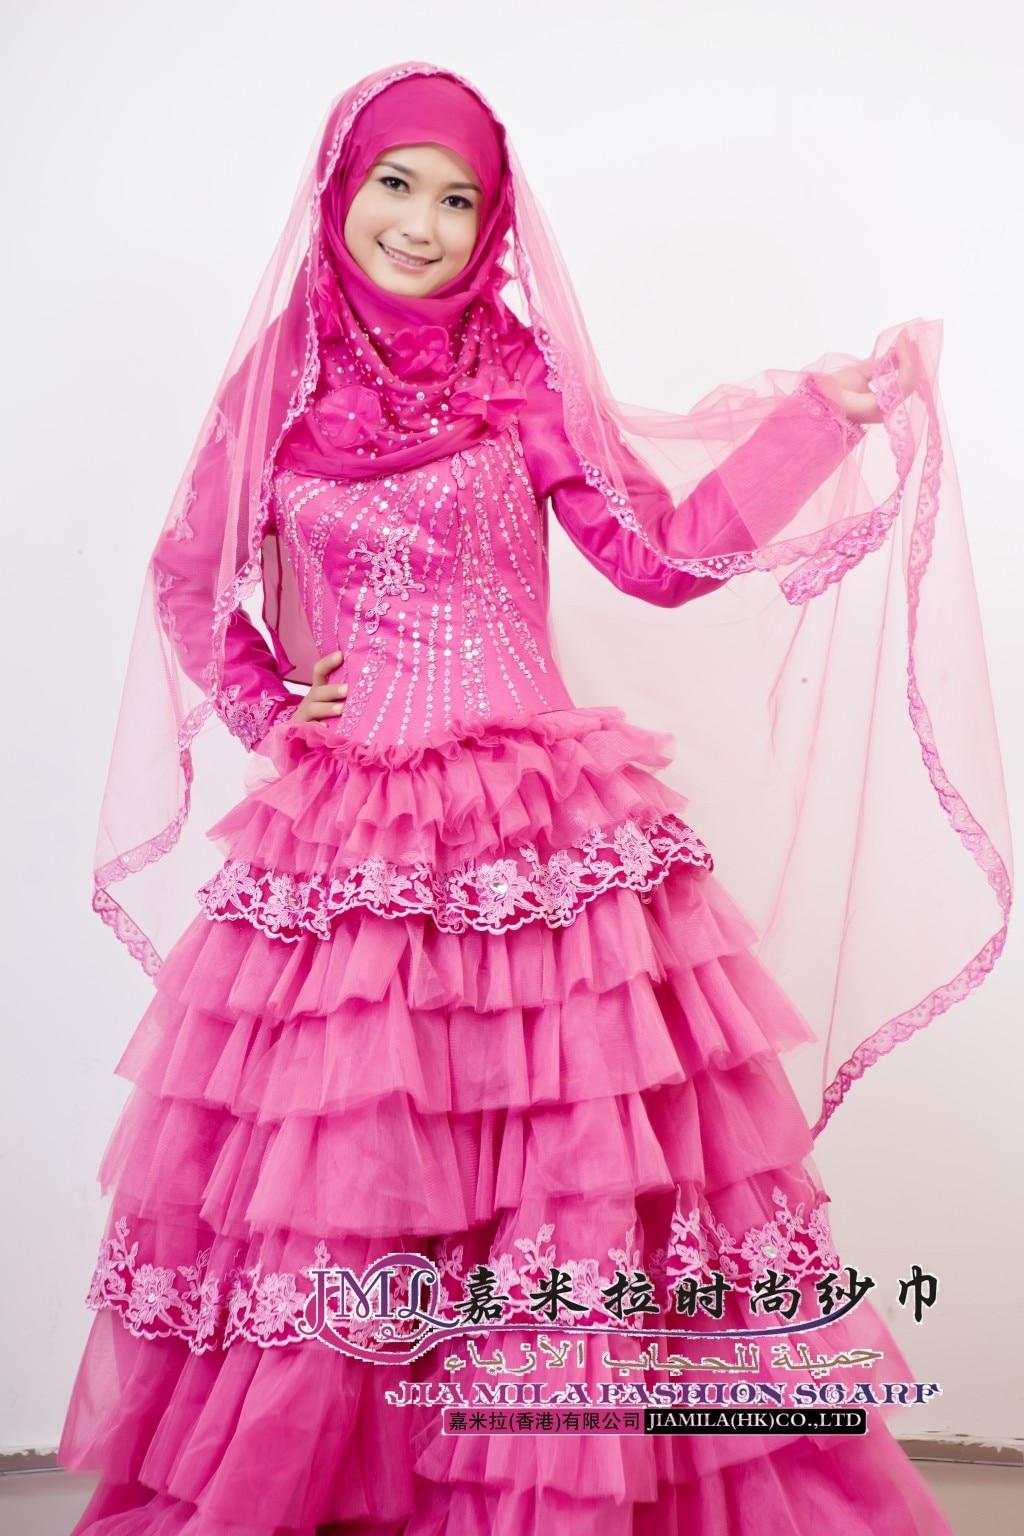 muslim wedding dress Wedding dress muslim wedding gown f in Wedding Dresses from Weddings Events on Aliexpress com Alibaba Group